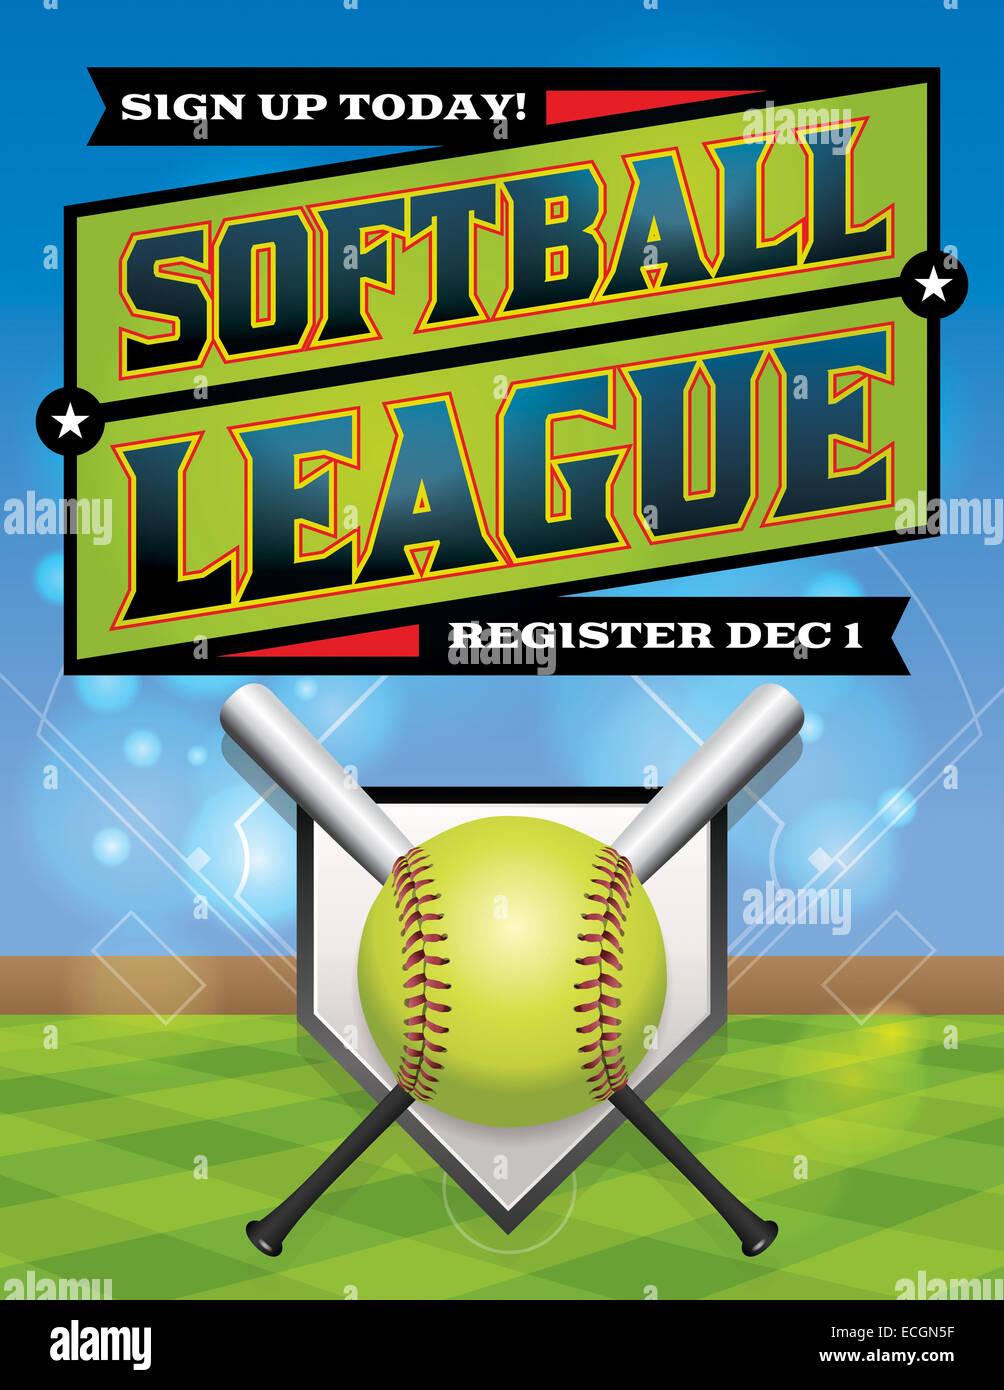 An illustration for a softball league flyer. Stock Photo